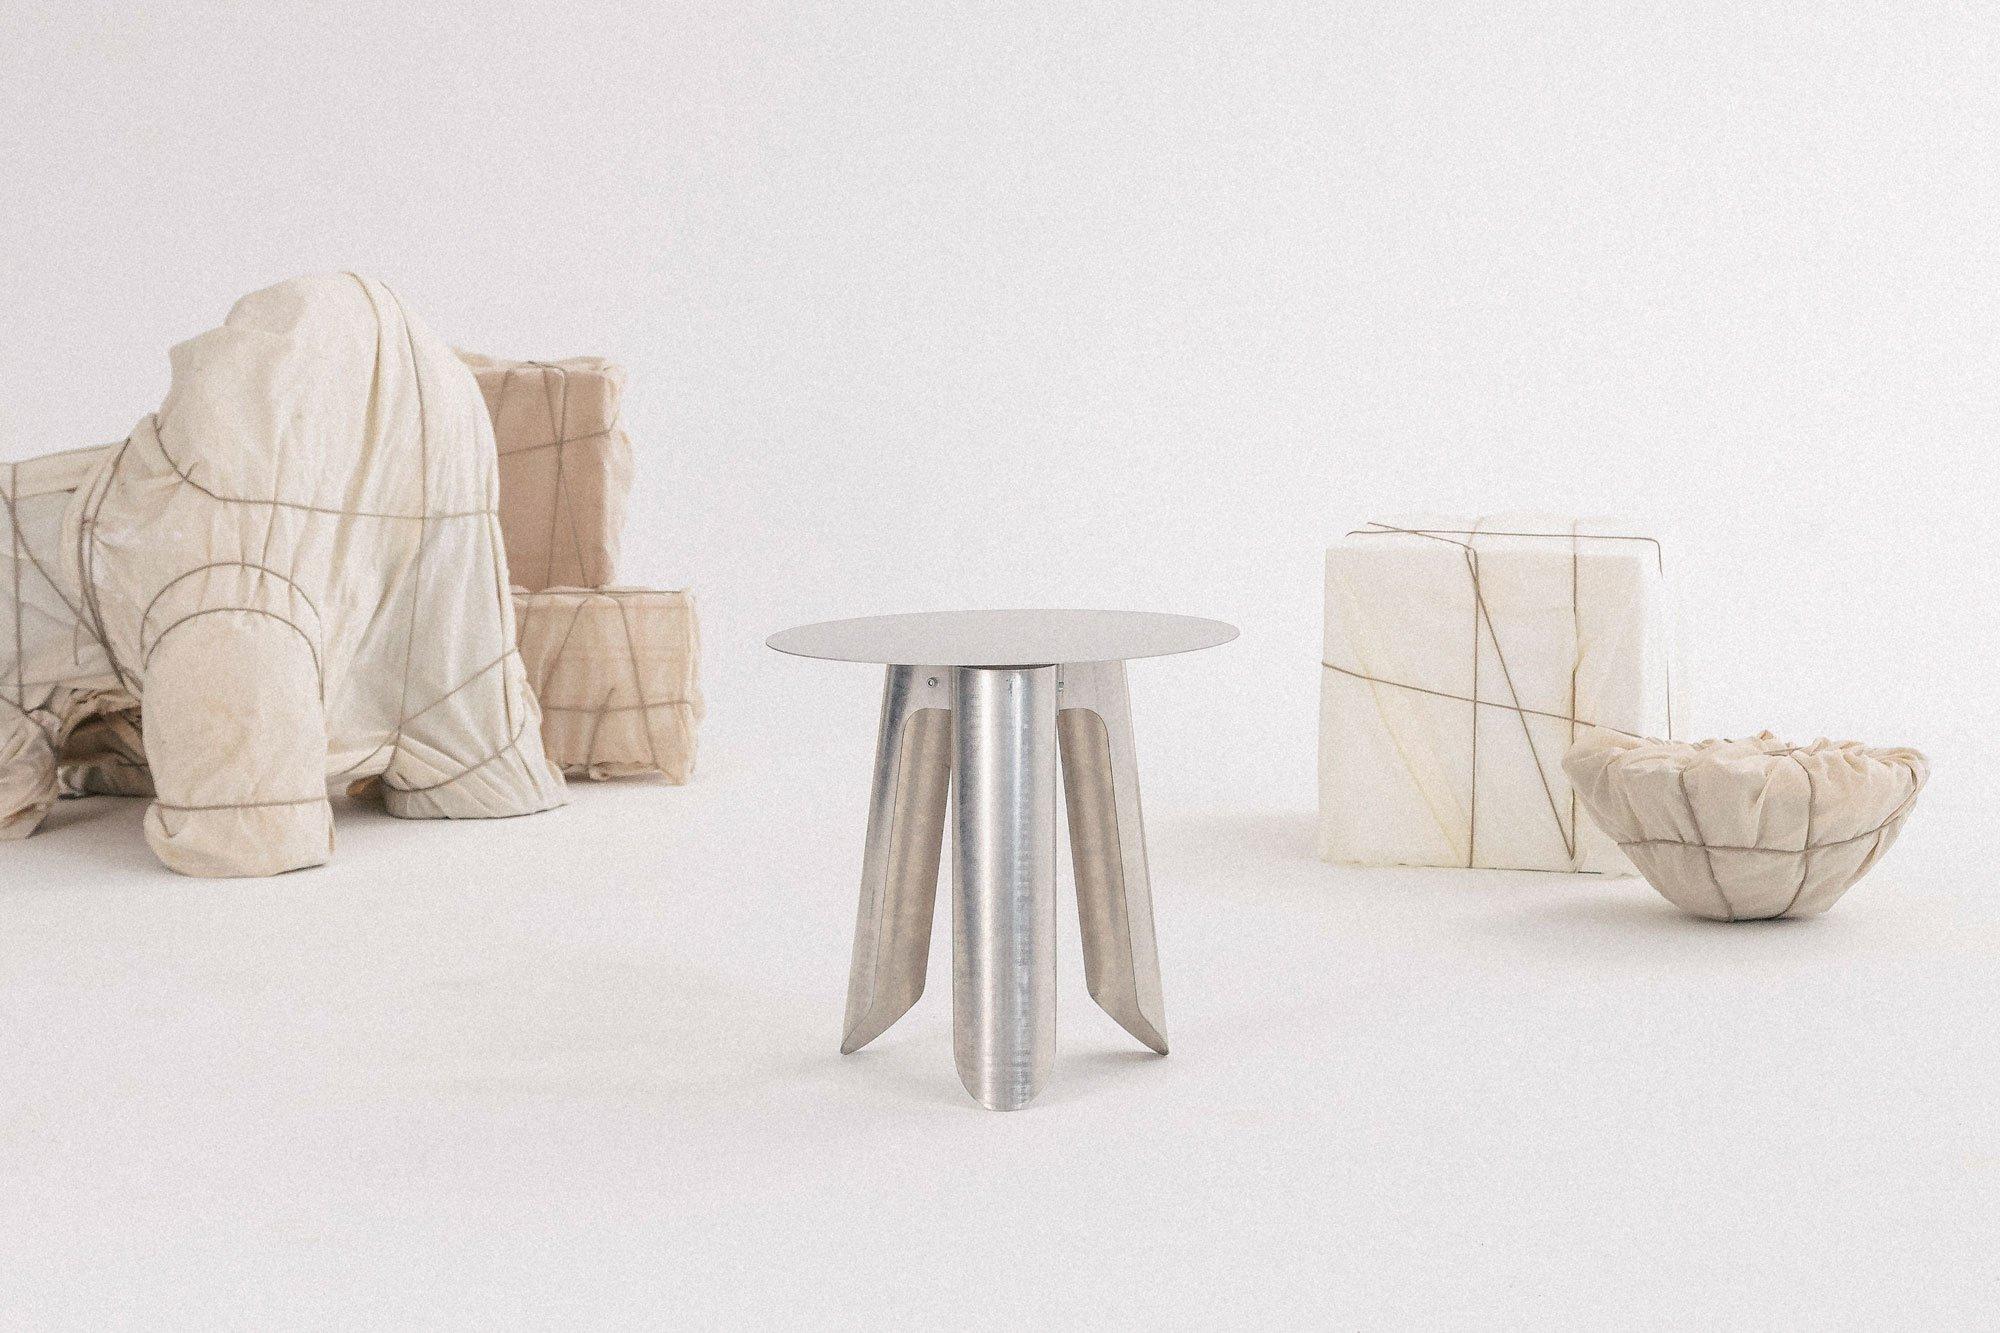 Ukurant Objects, 3daysofdesign 2020, jeunes designers, Anders Nyberg